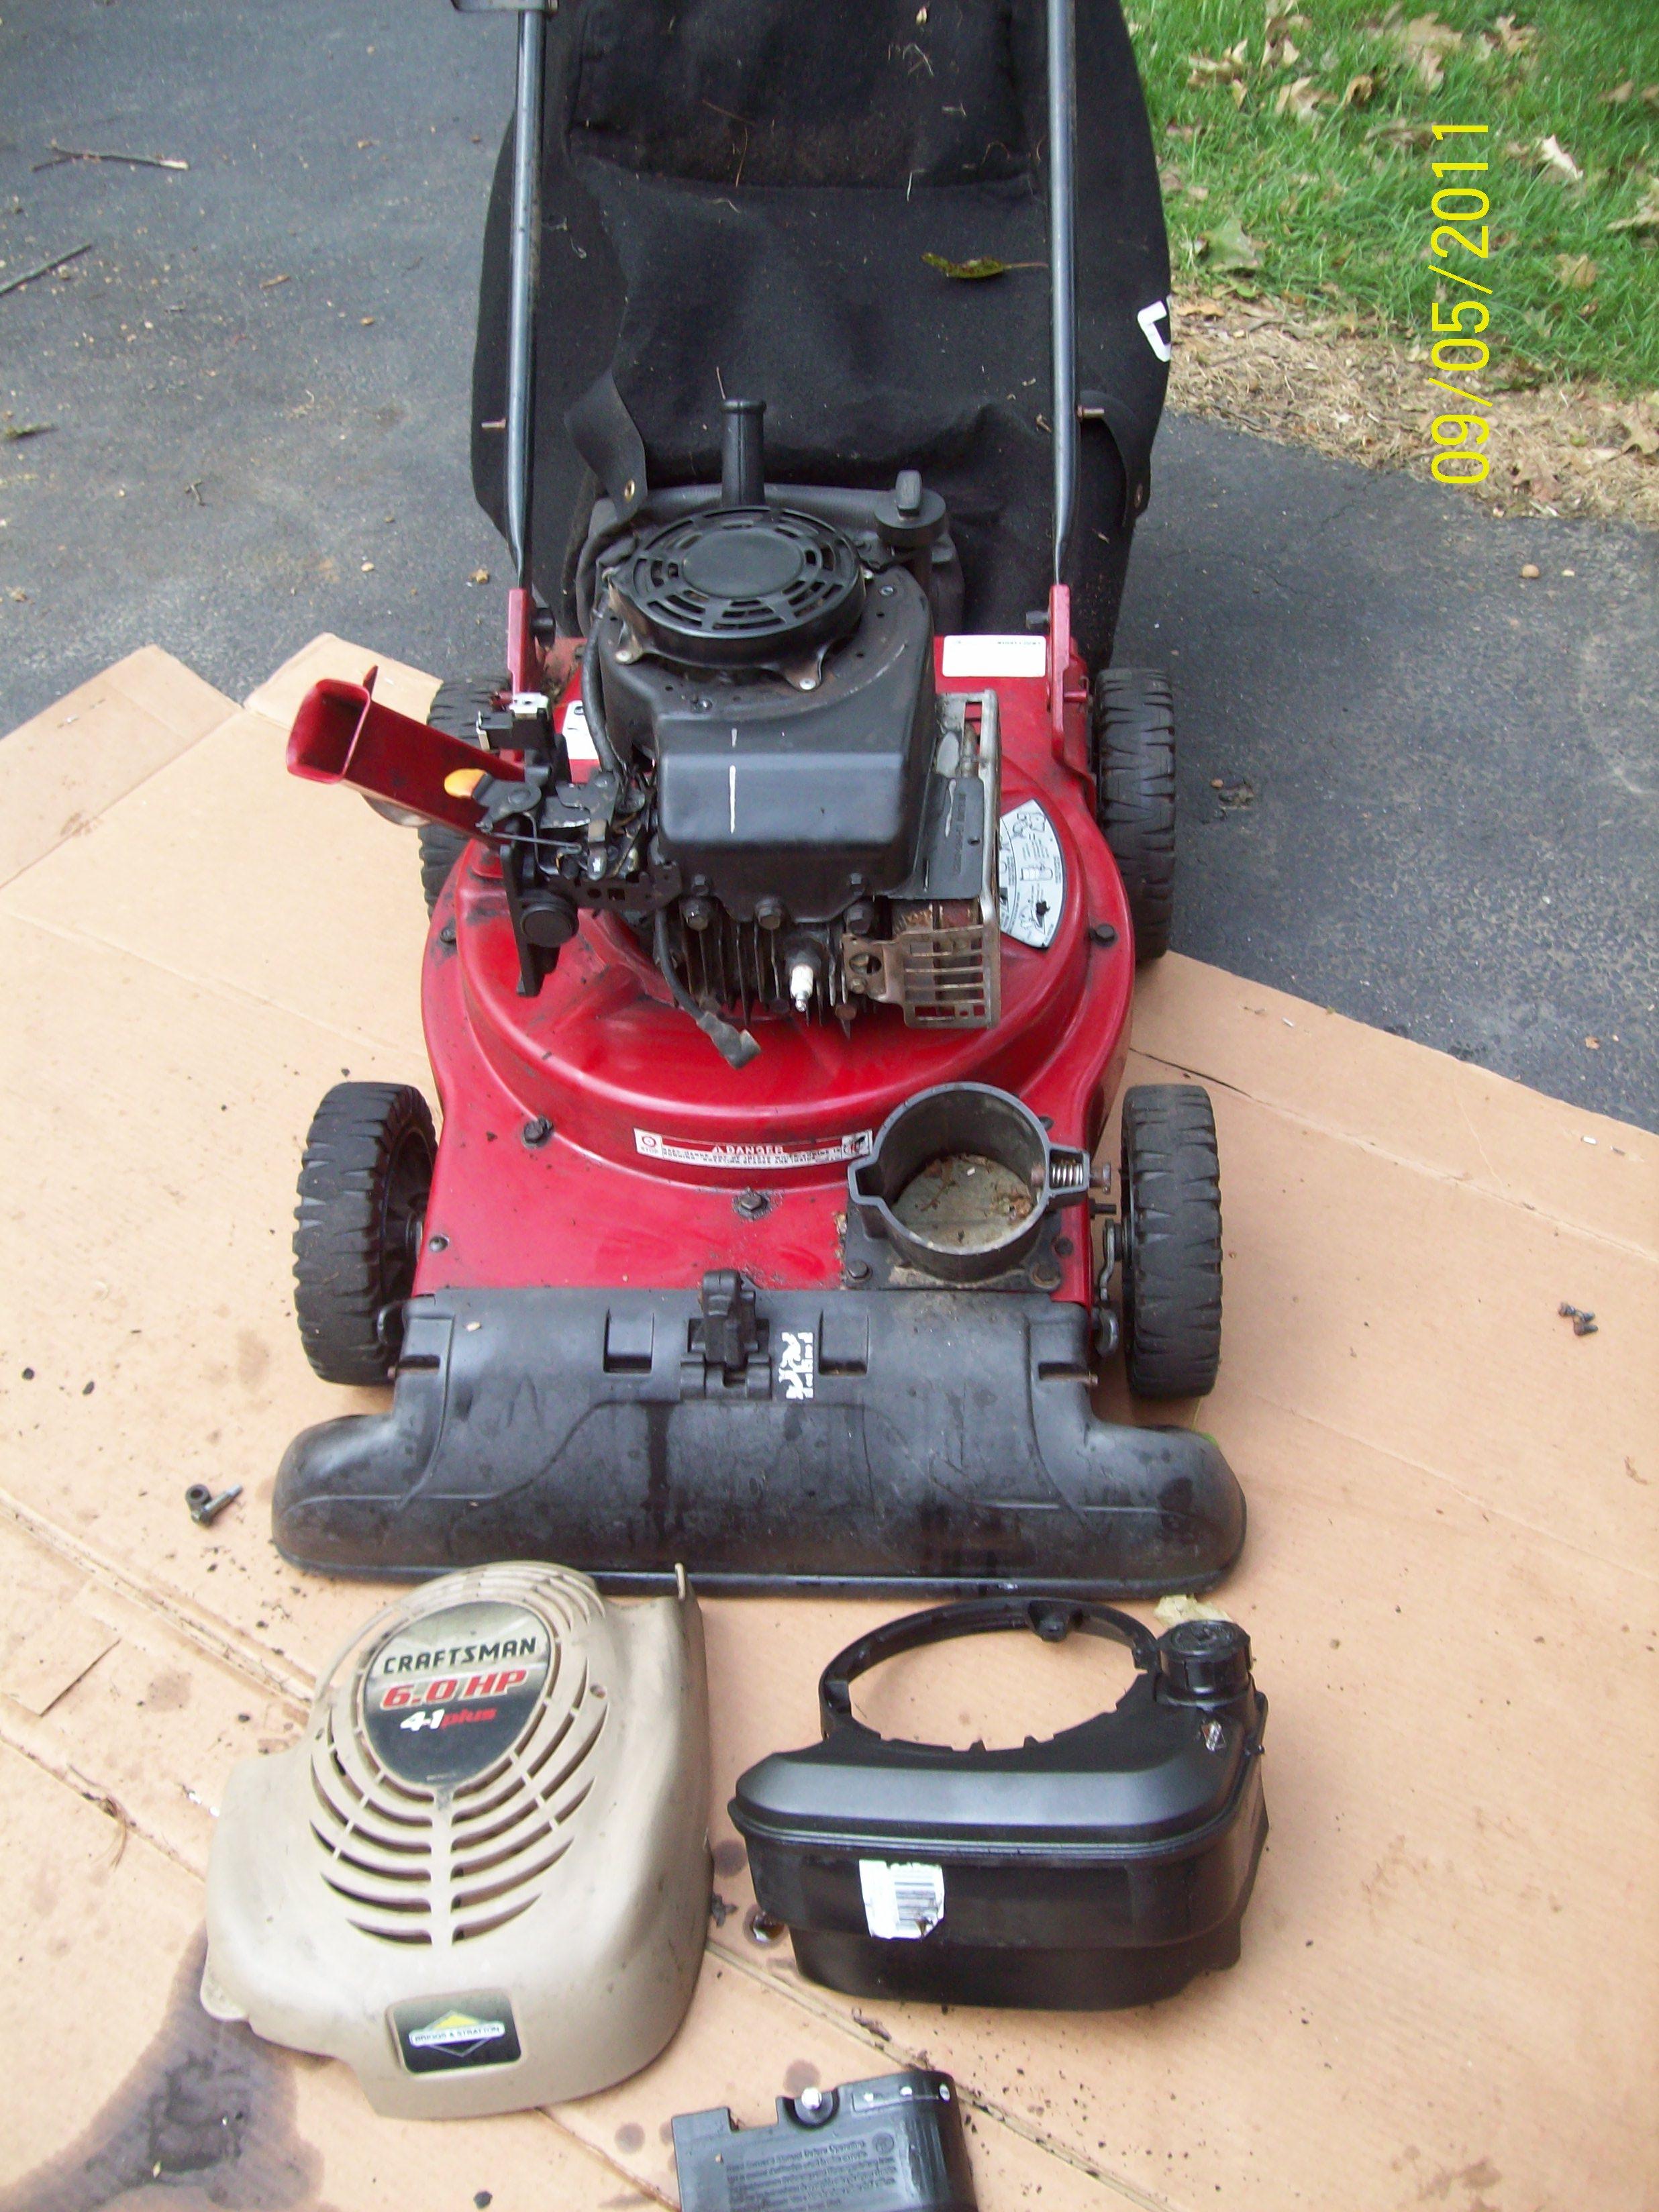 Craftsman Yard Vacuum 4 5 : Hello i have a craftsman in yard vac started it